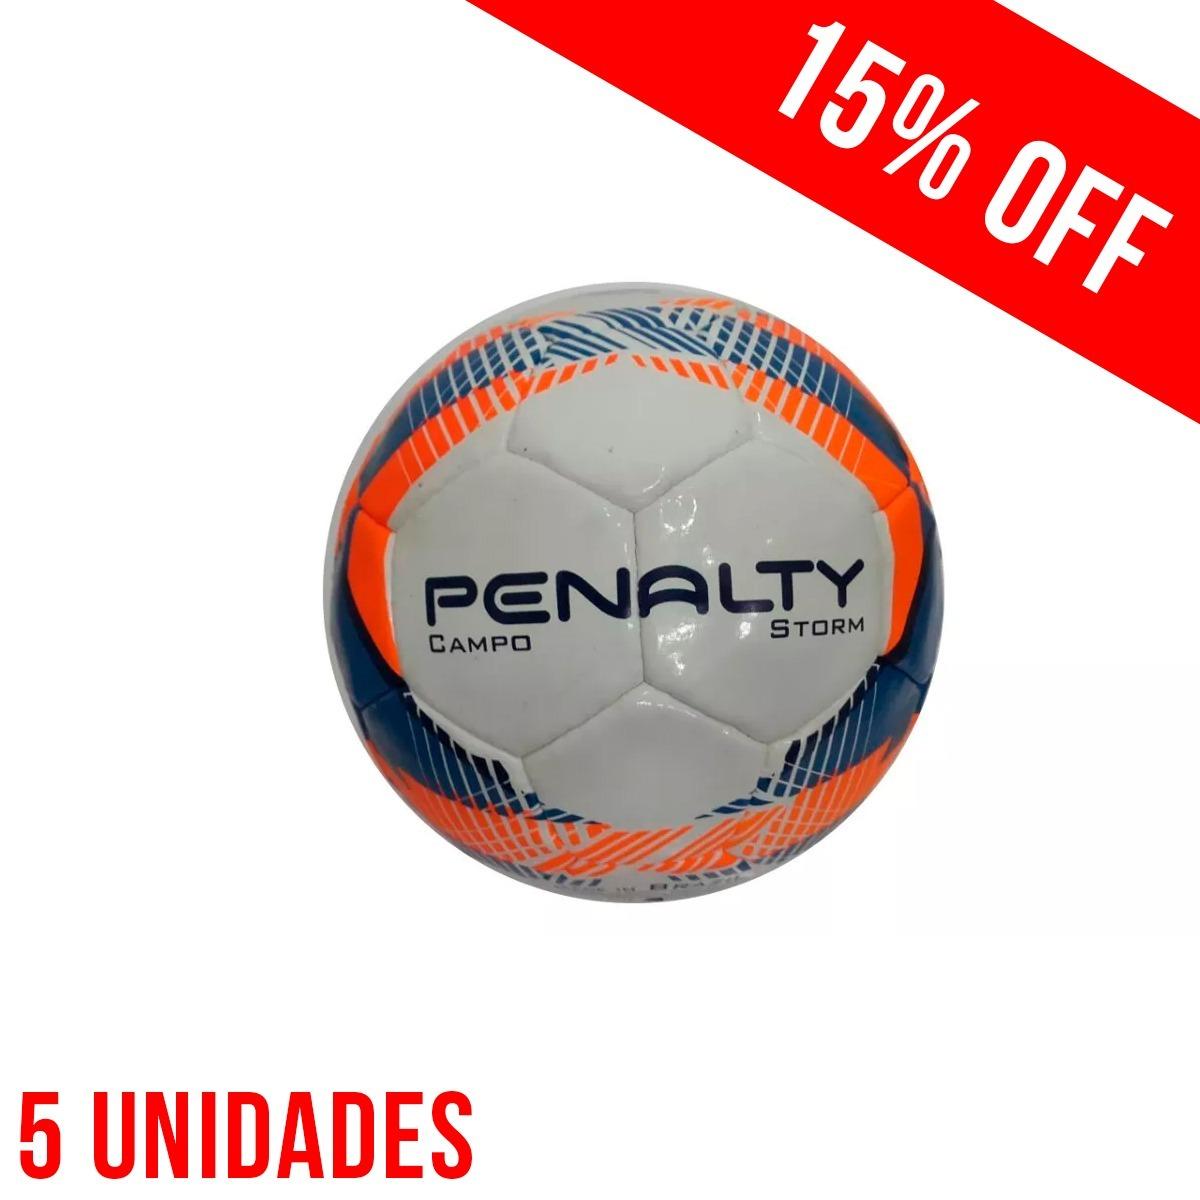 pelotas futbol penalty campo storm por mayor 5 unidades. Cargando zoom. 9eca92006e754